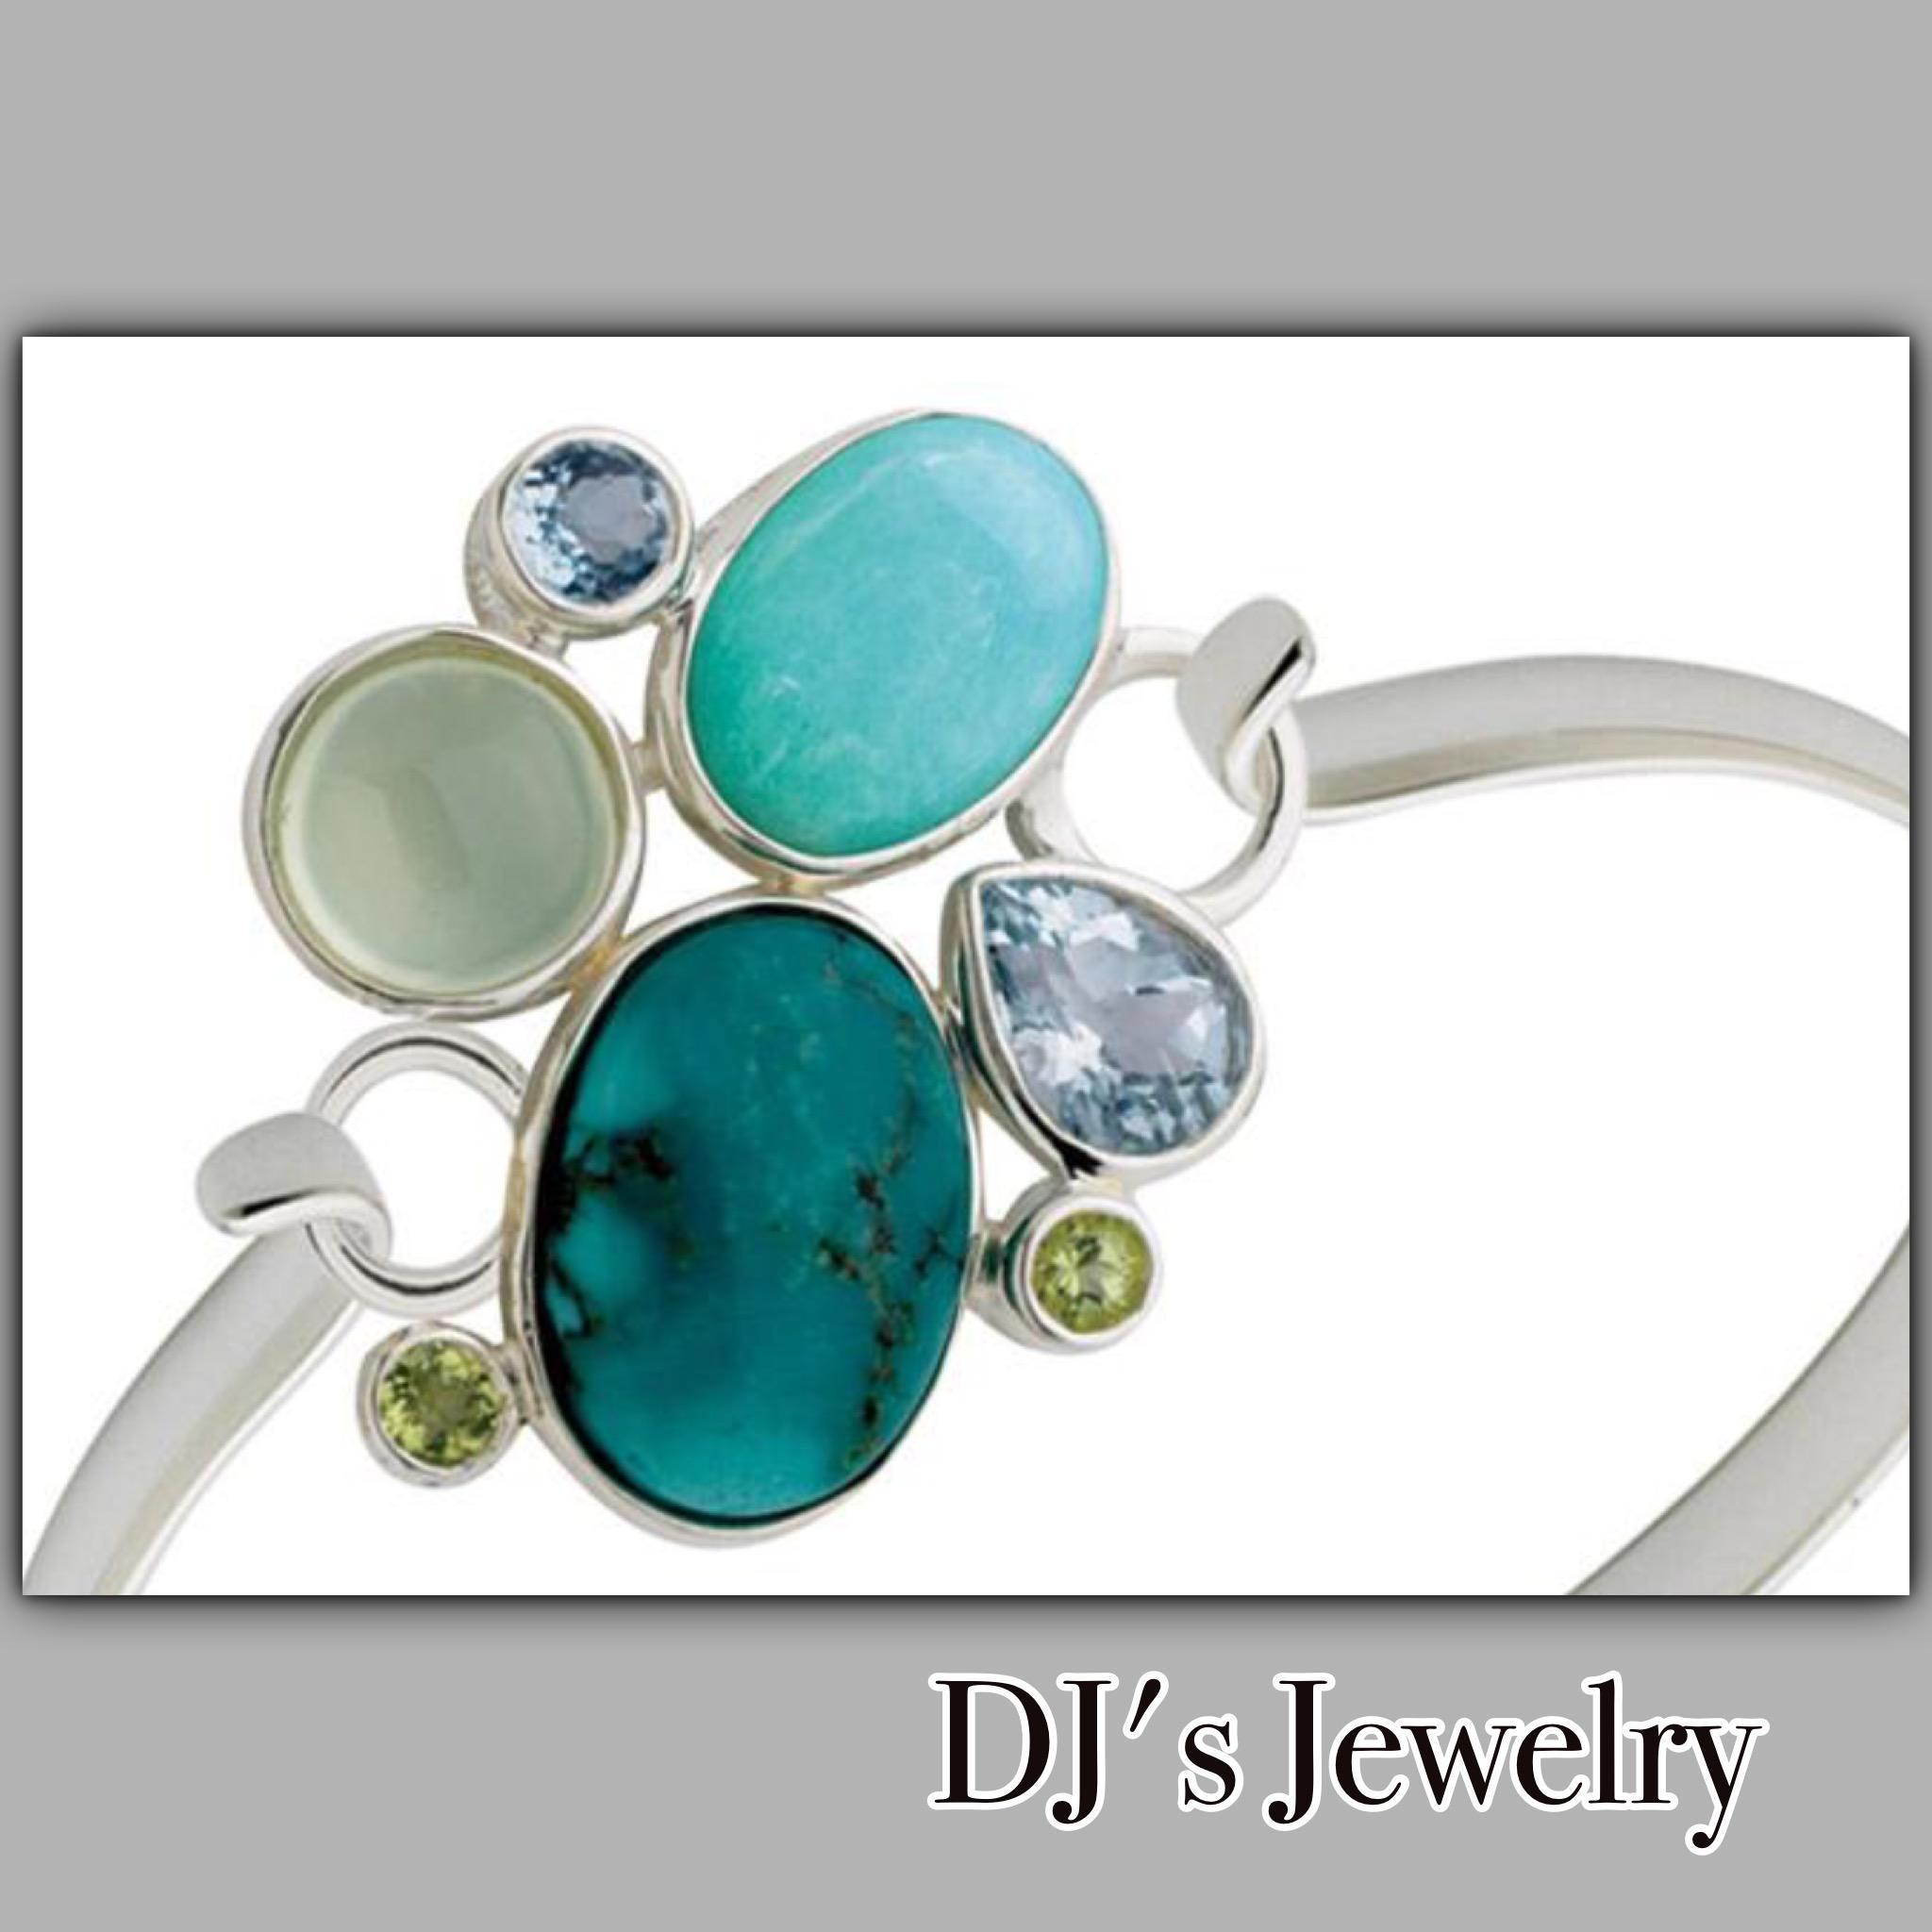 Name Brand Bracelets: The Convertible Charm Bracelets Collection